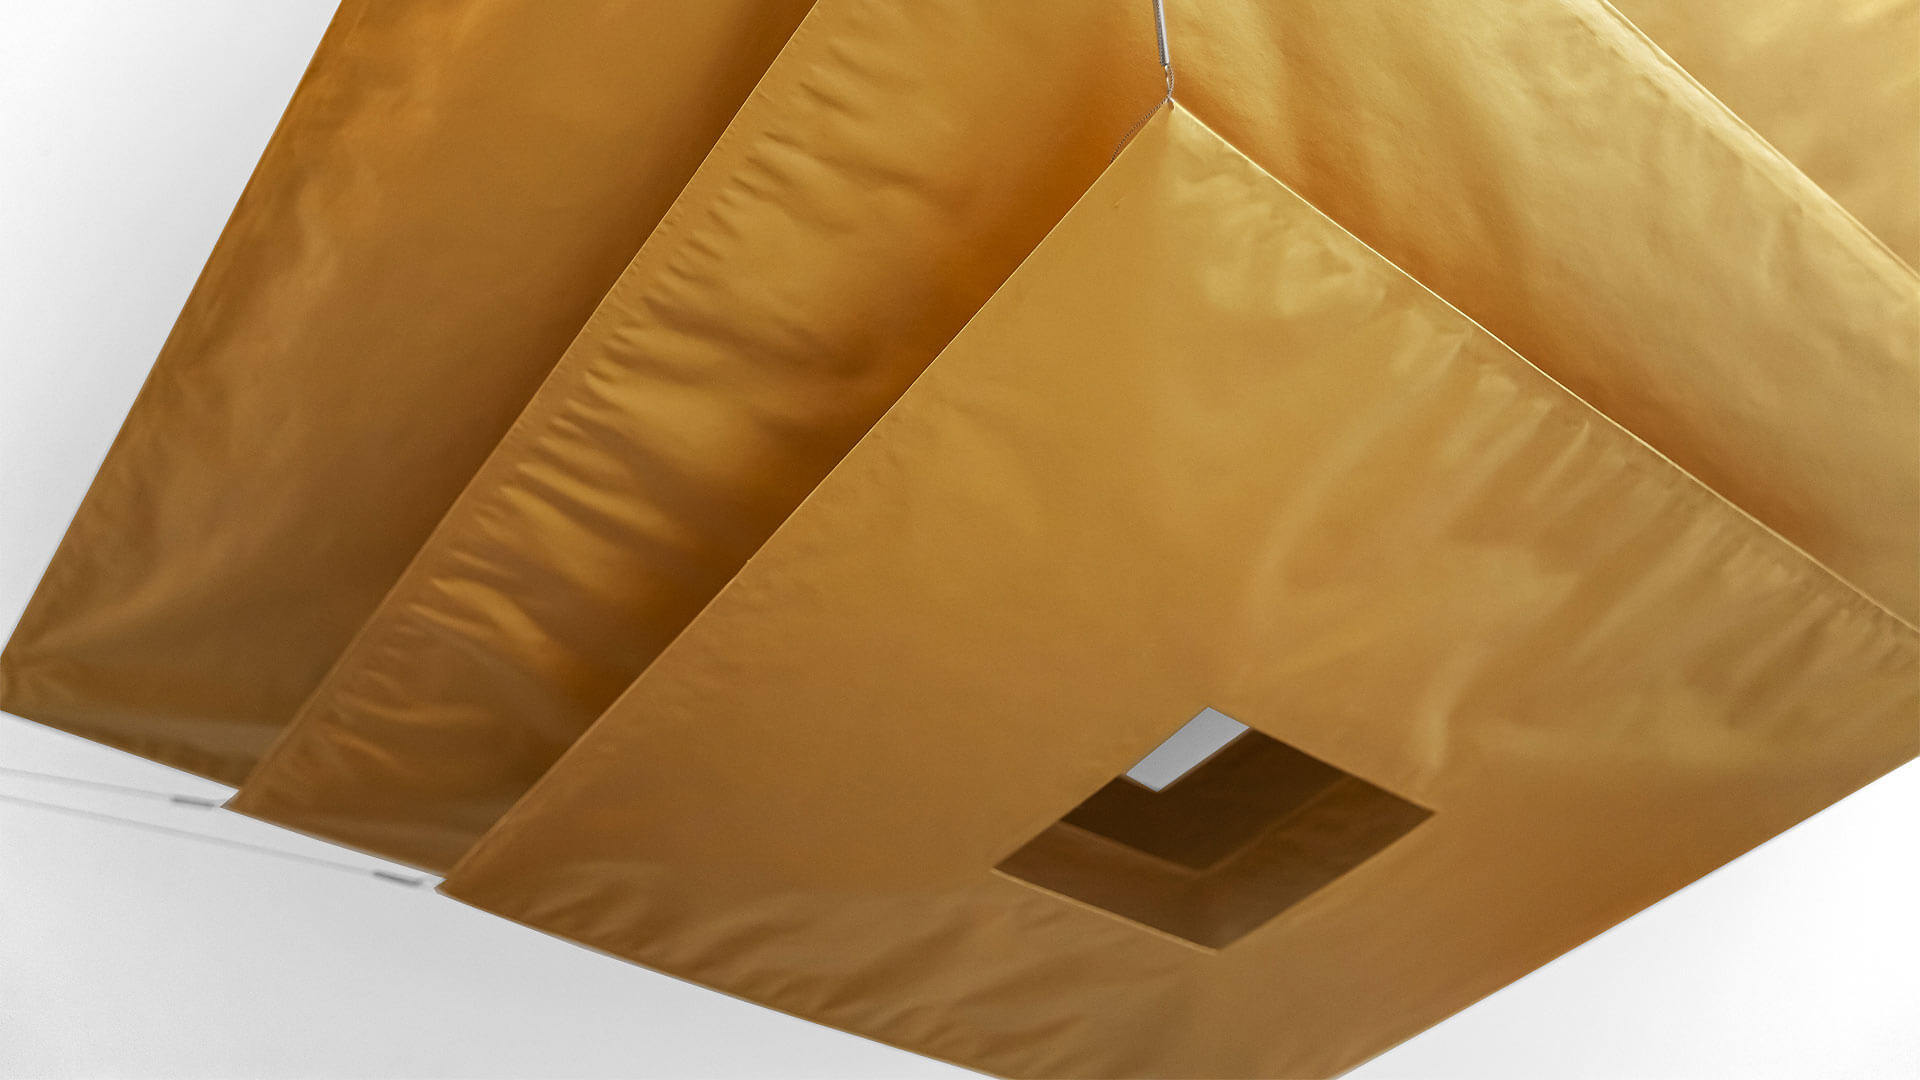 Lil Luxury Fabric Light Fixture by Ingo Maurer (Master Bedroom) - Bridge House - Fenneville, Michigan - Lake Michigan